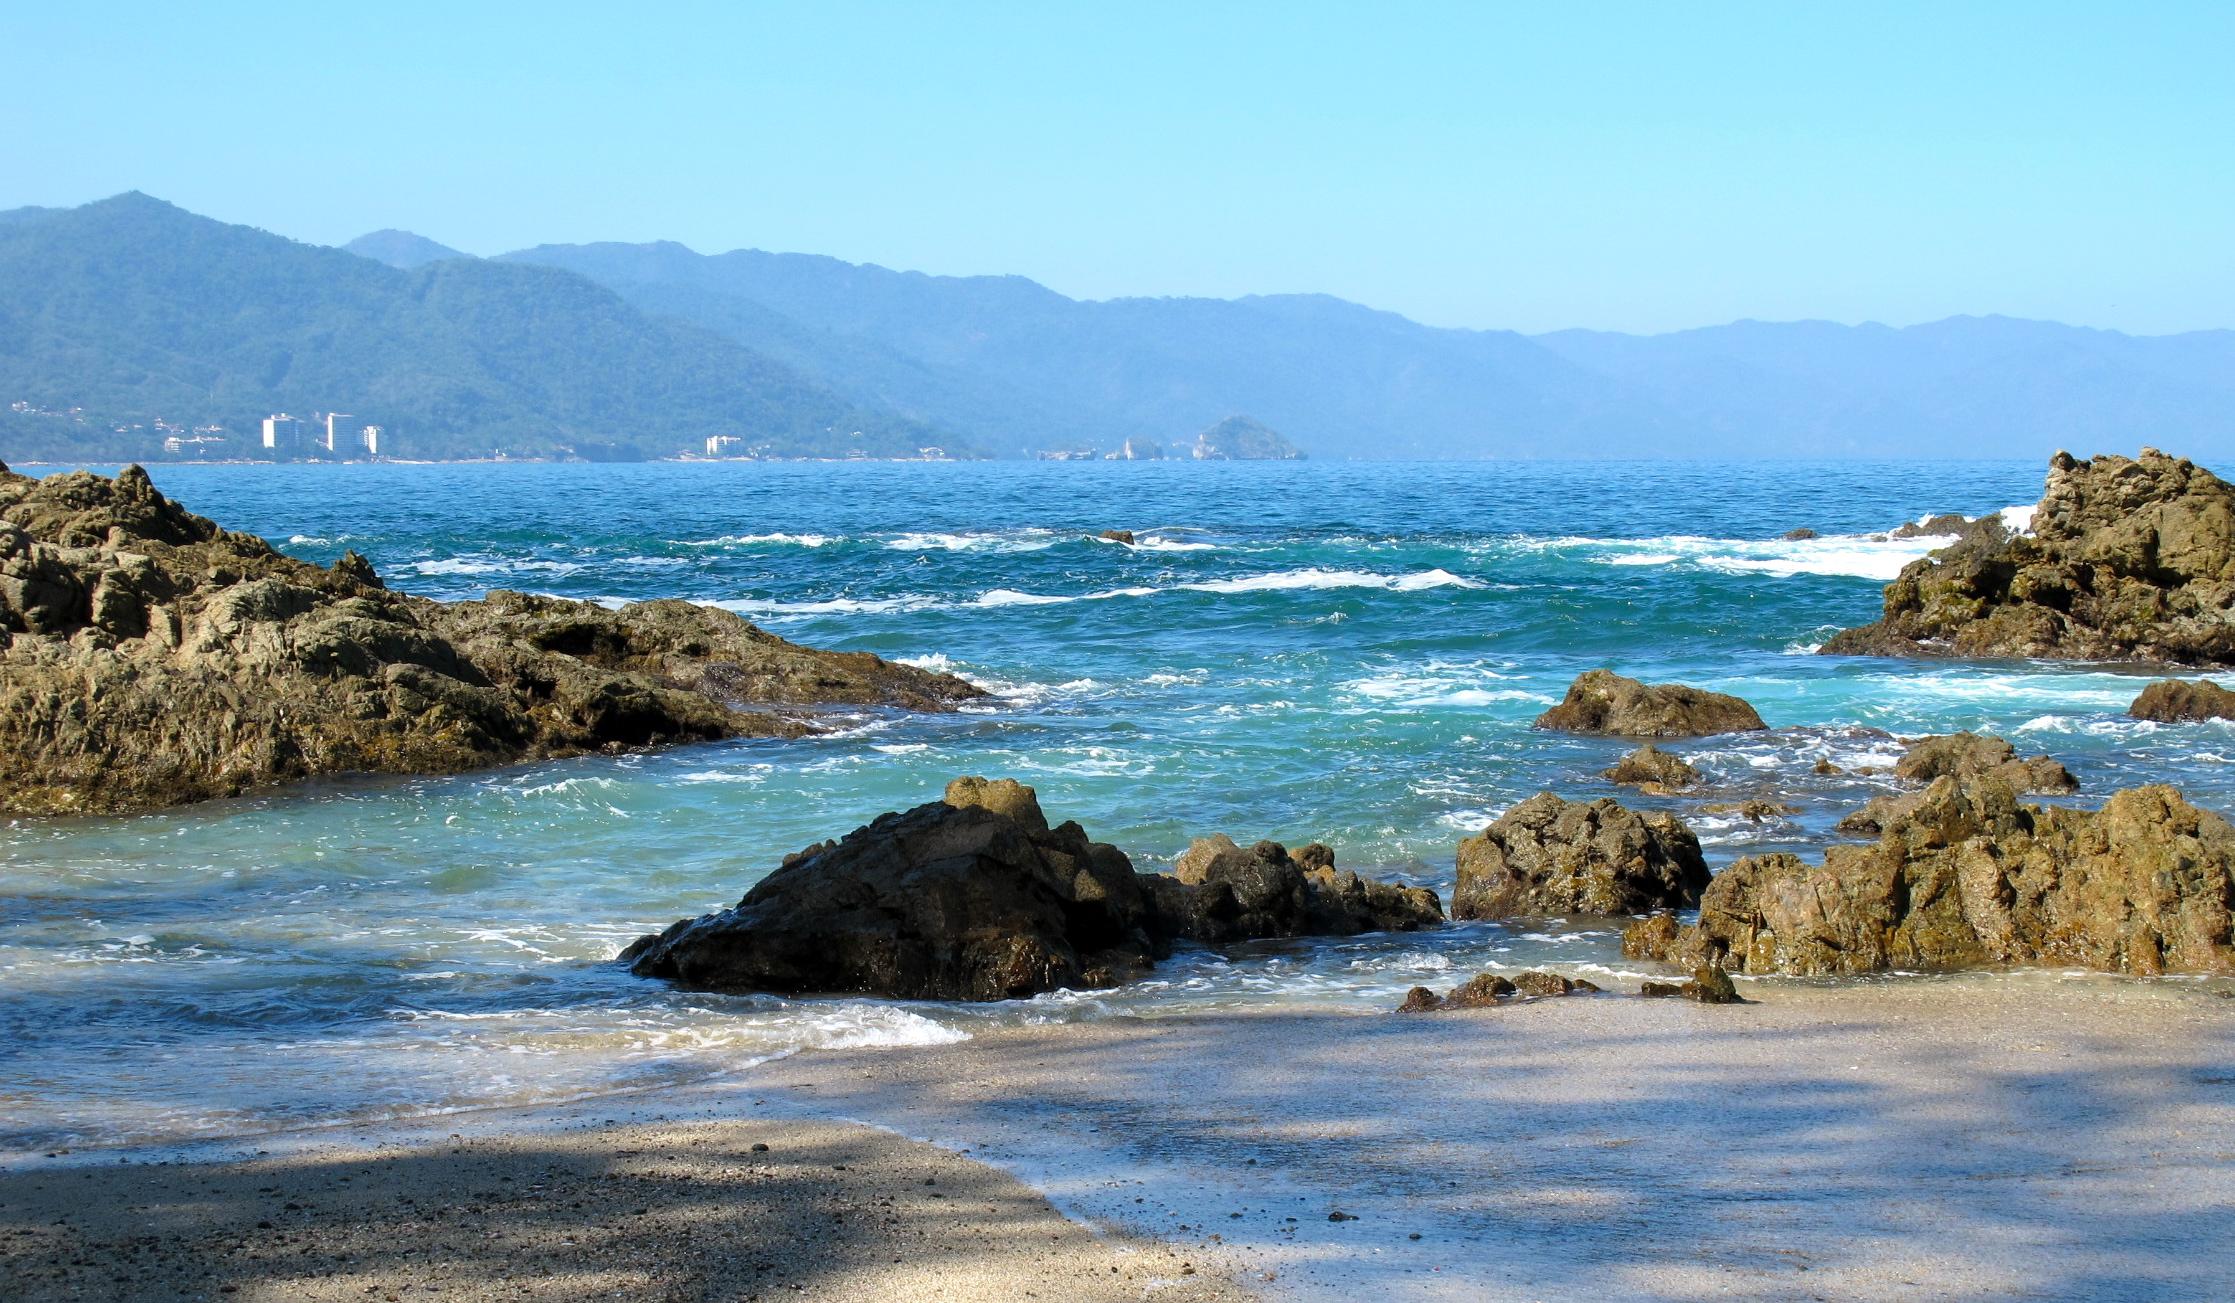 vista de la playa Mismaloya